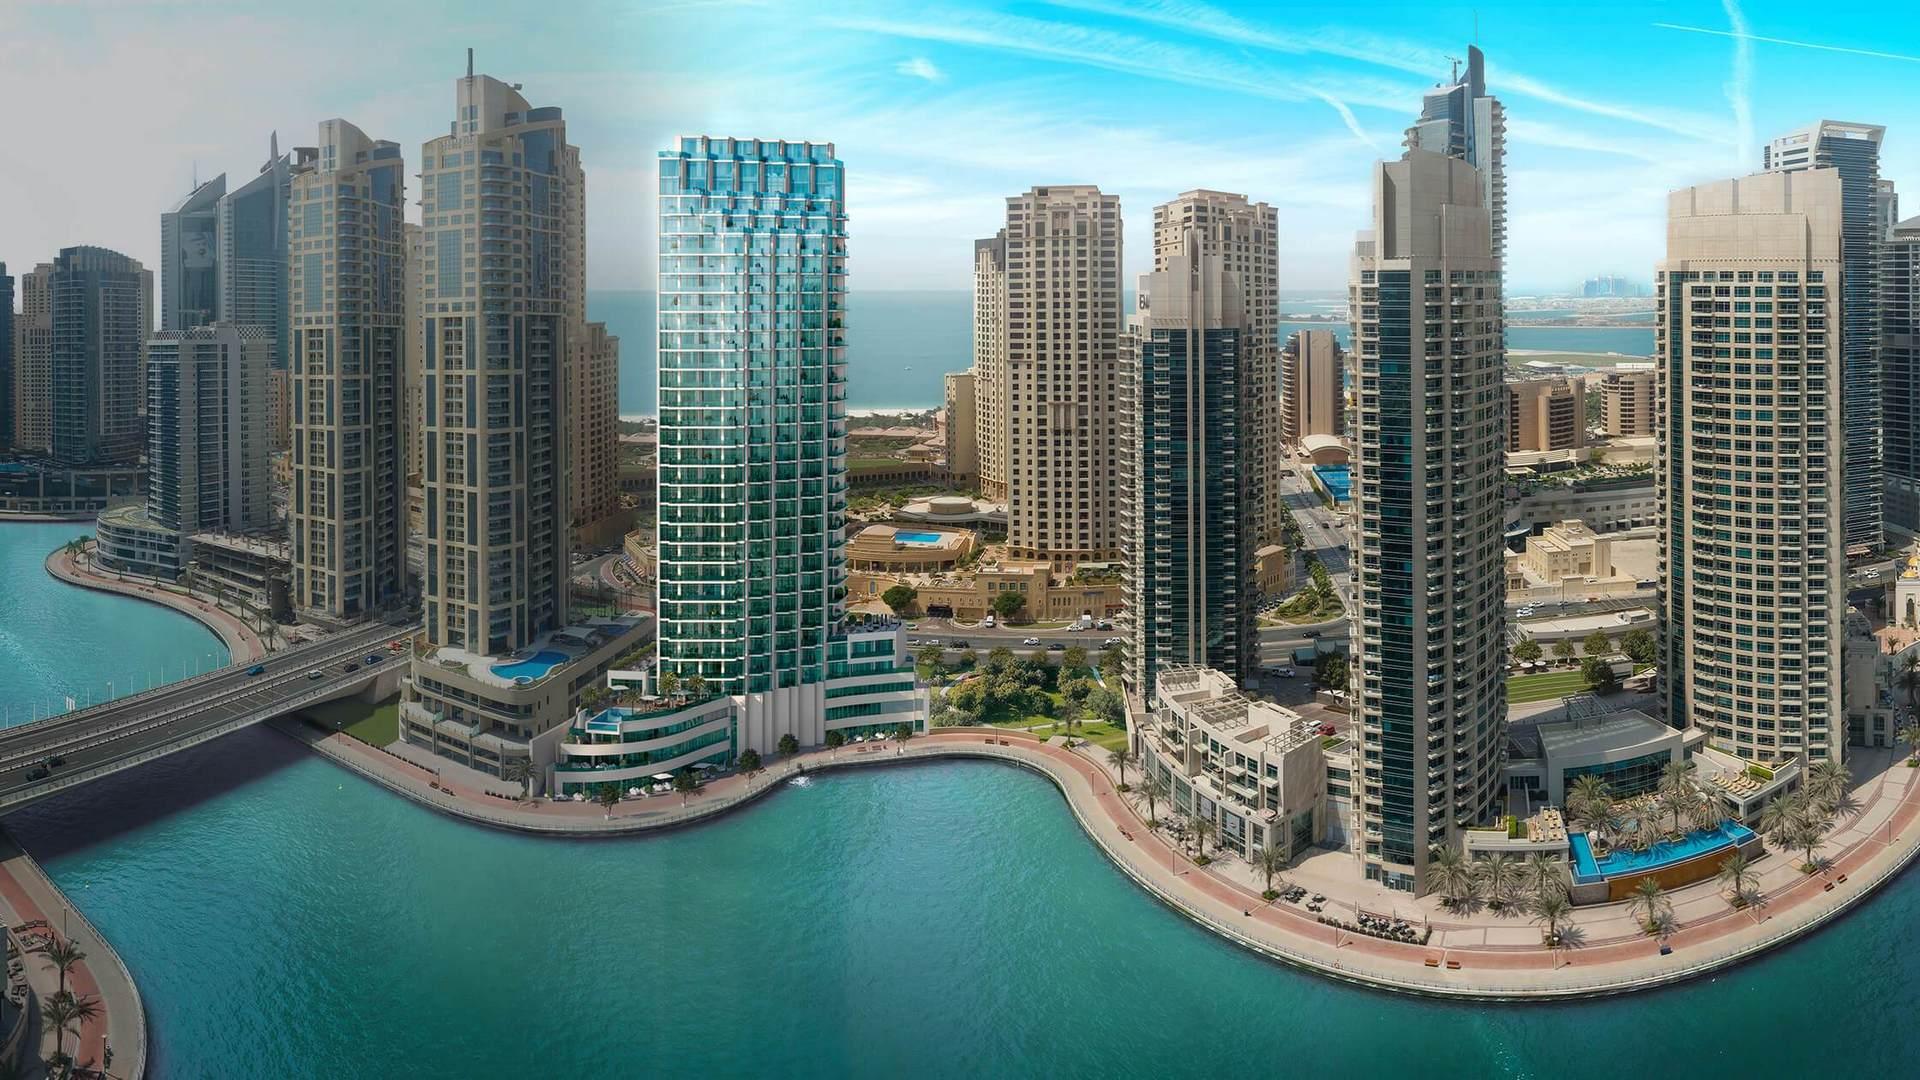 LIV RESIDENCE, Dubai Marina, UAE – photo 2